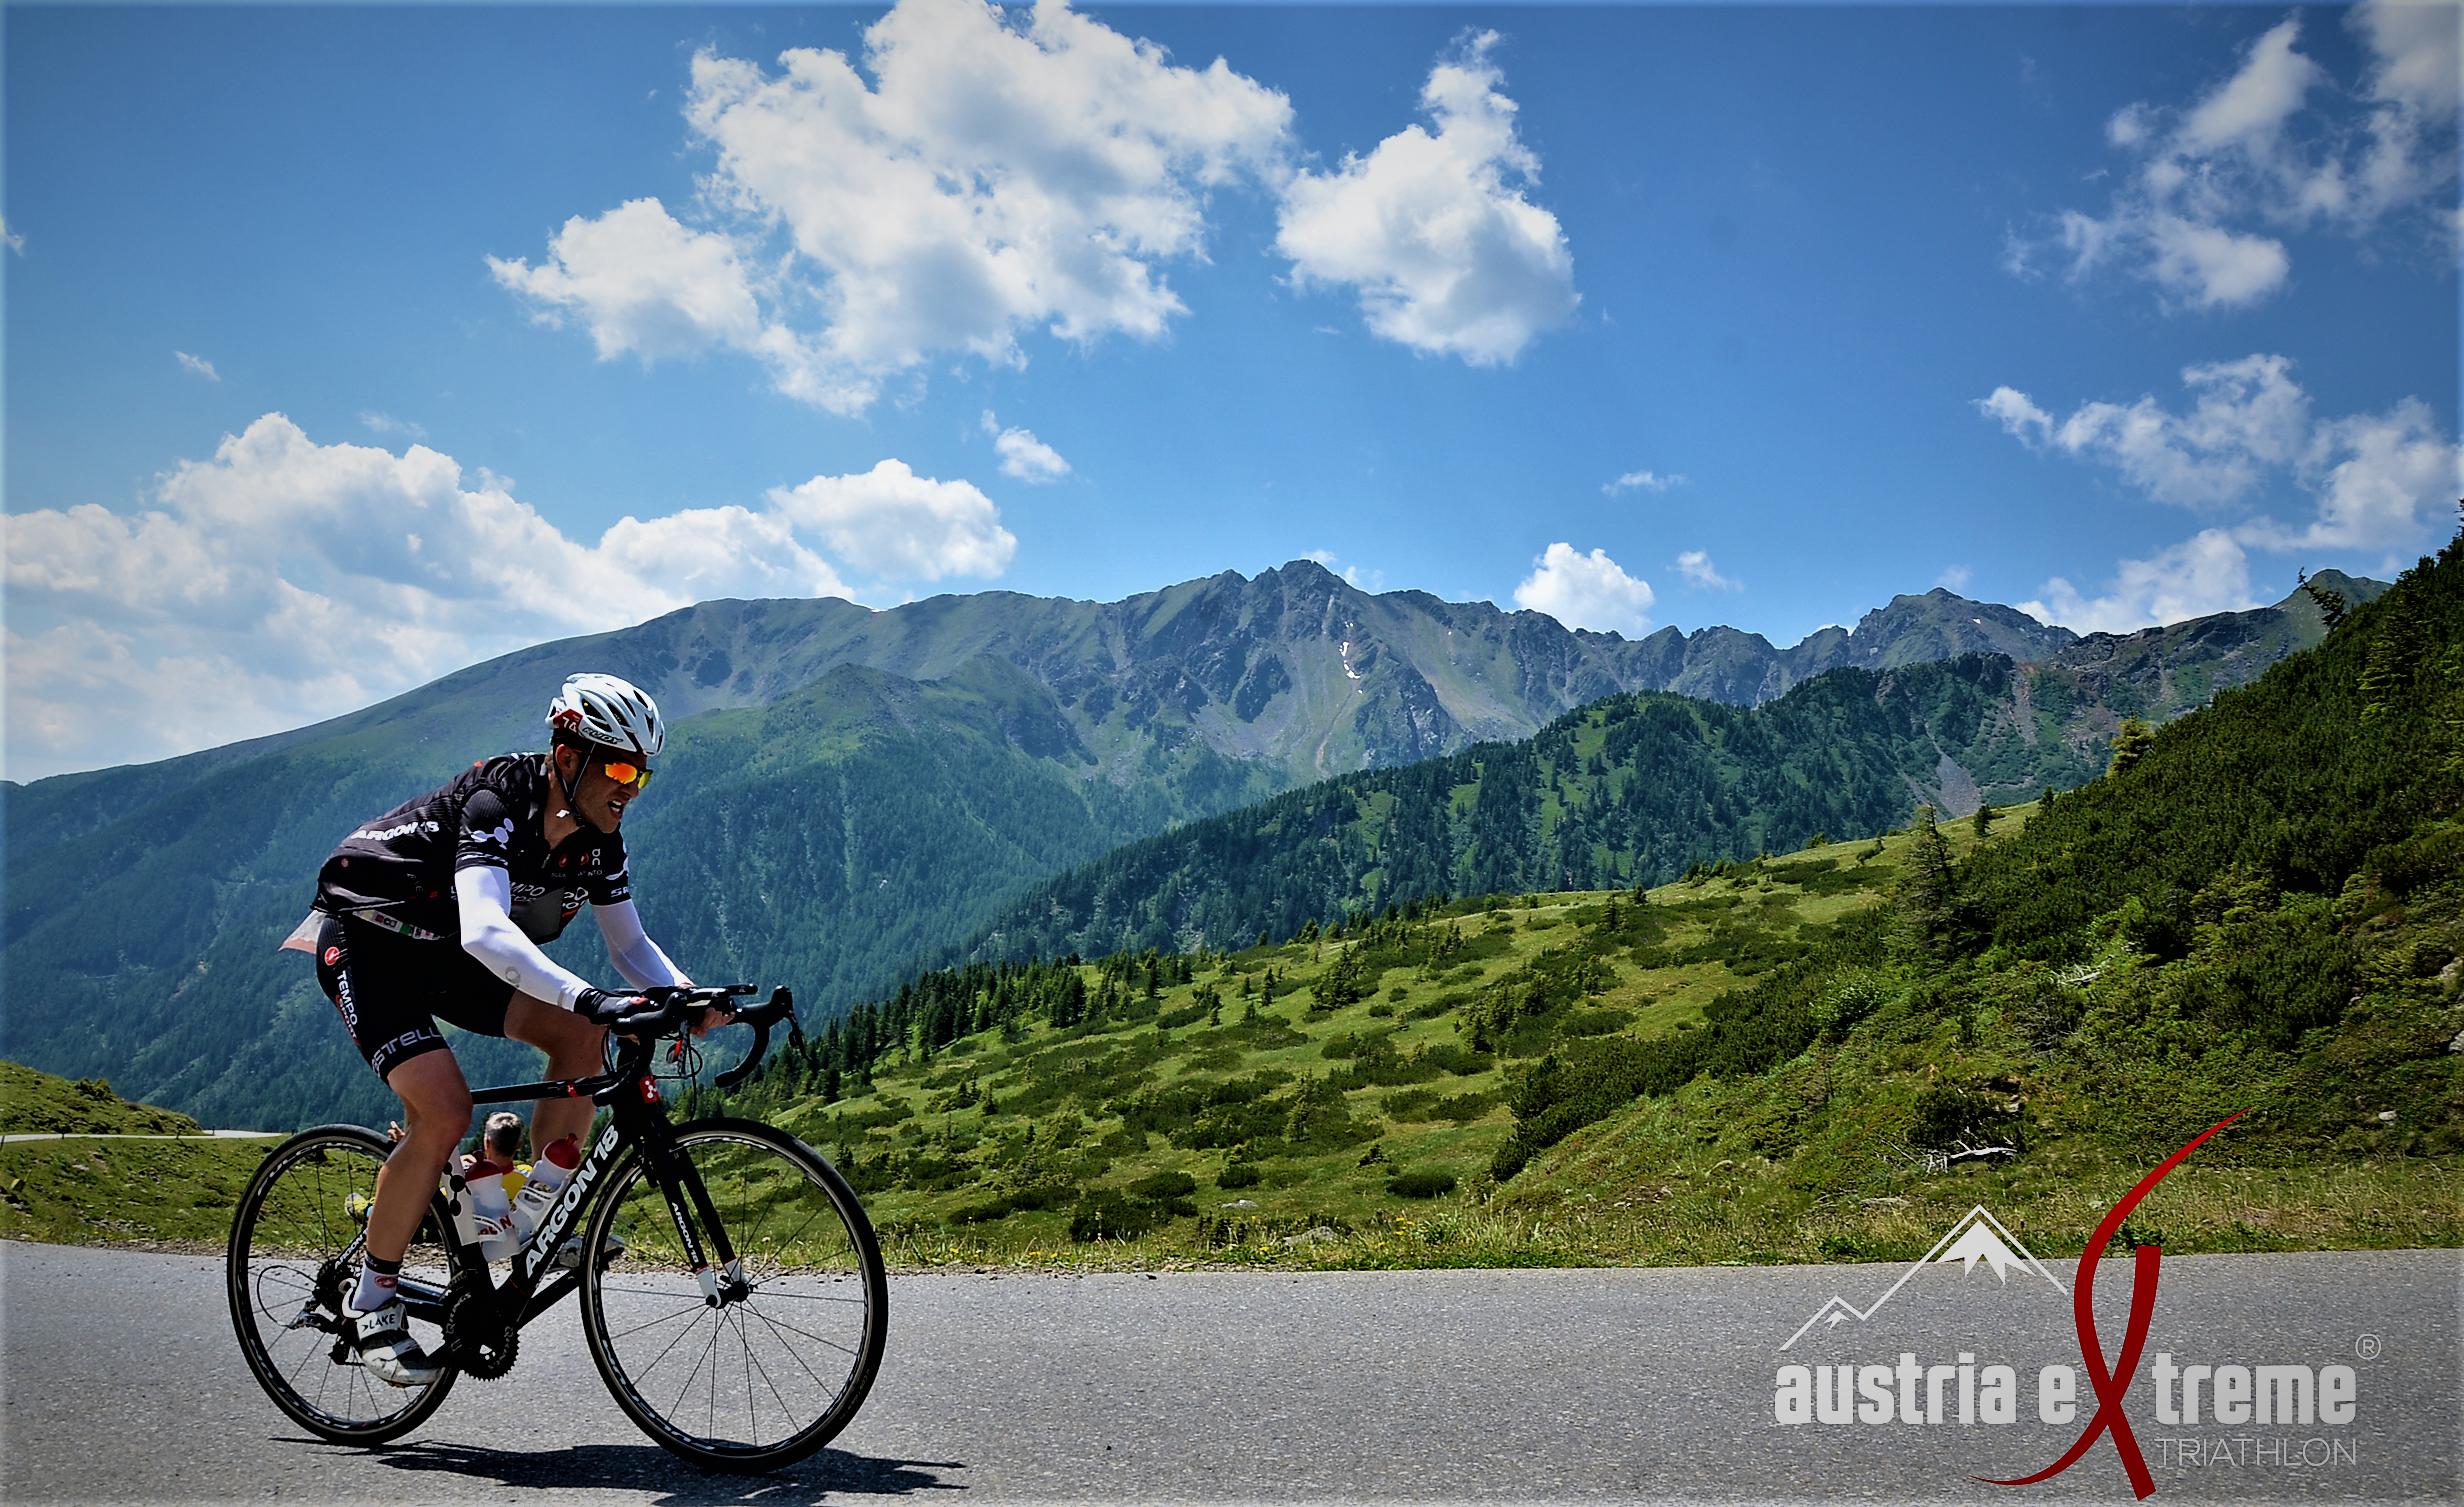 photo credit by Austria eXtreme Triathlon